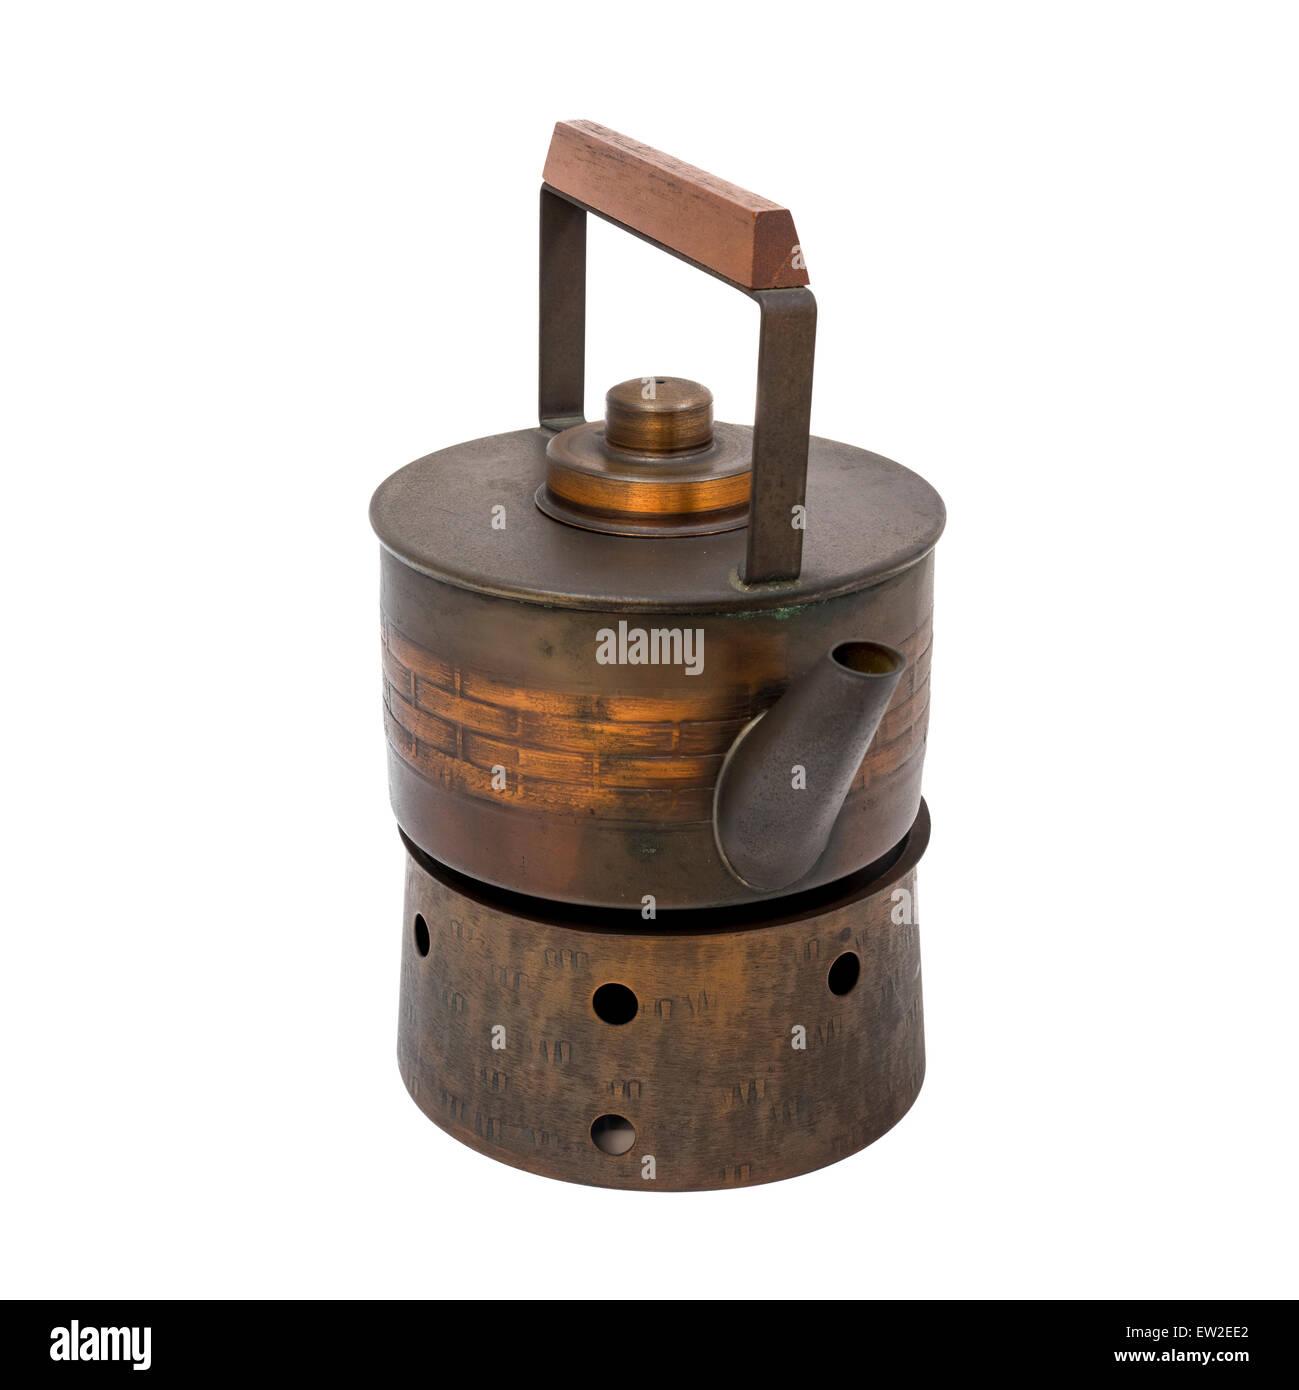 Japanese Style copper kettle on stove, isolate white background - Stock Image